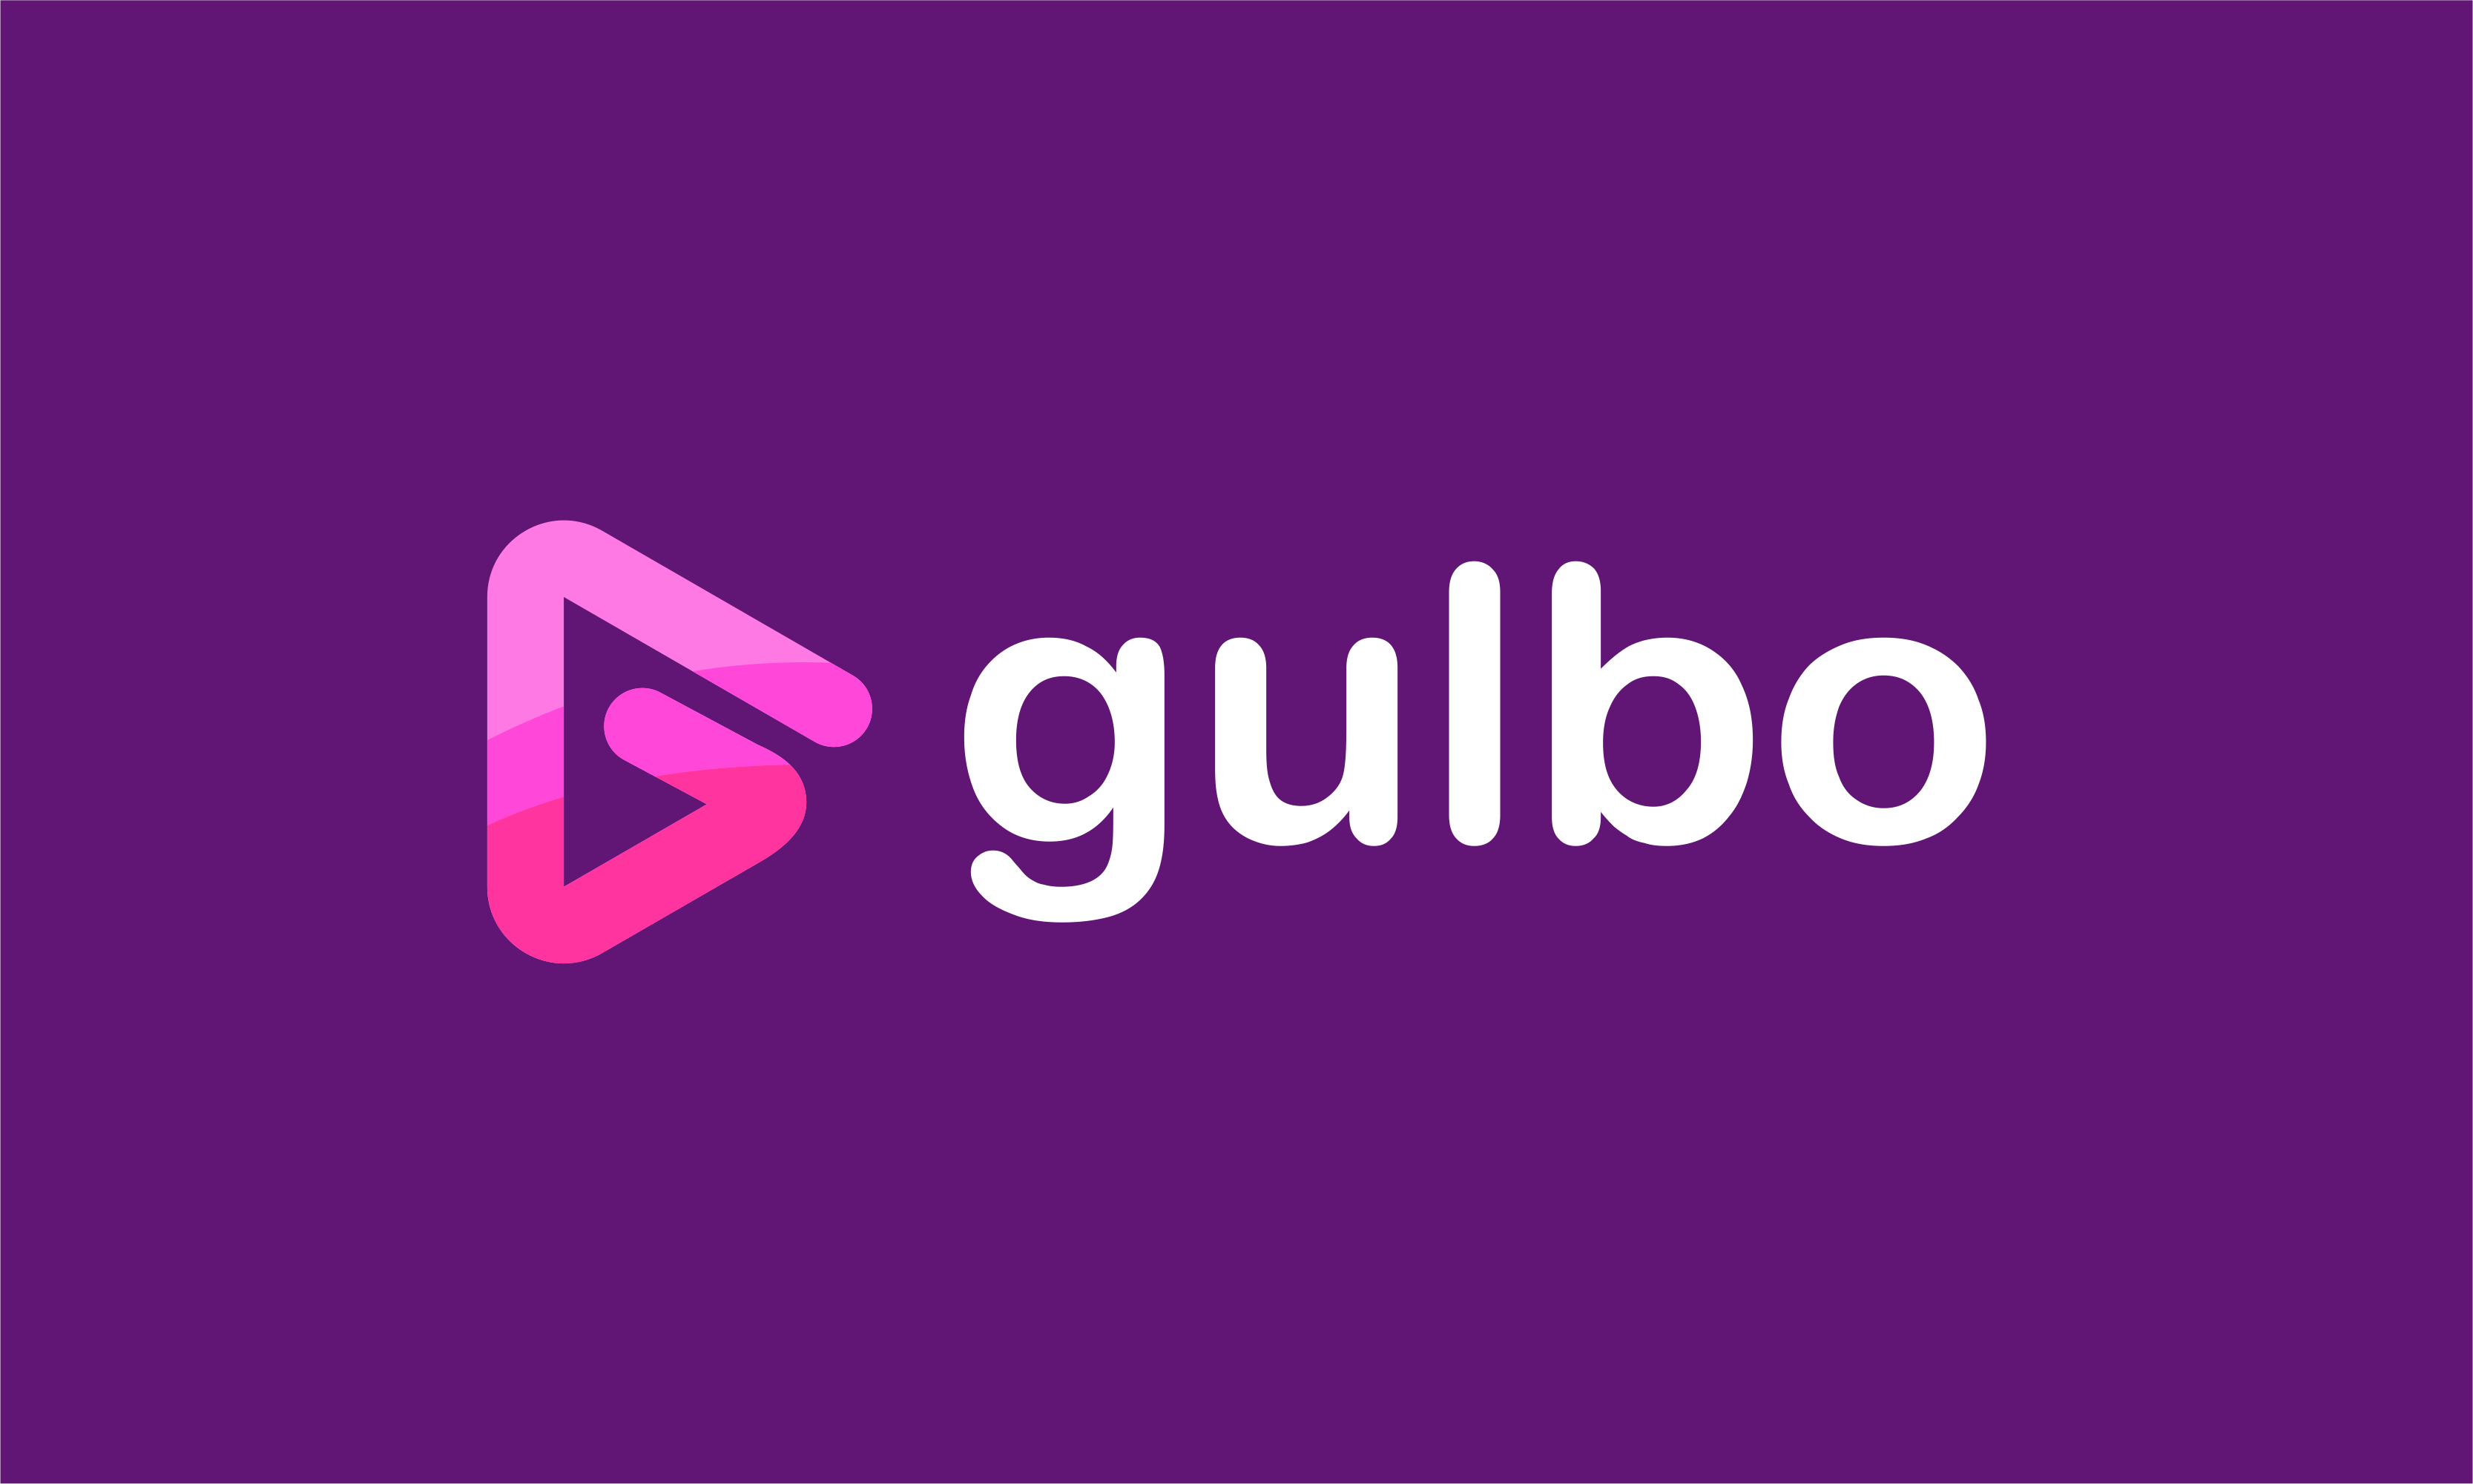 Gulbo